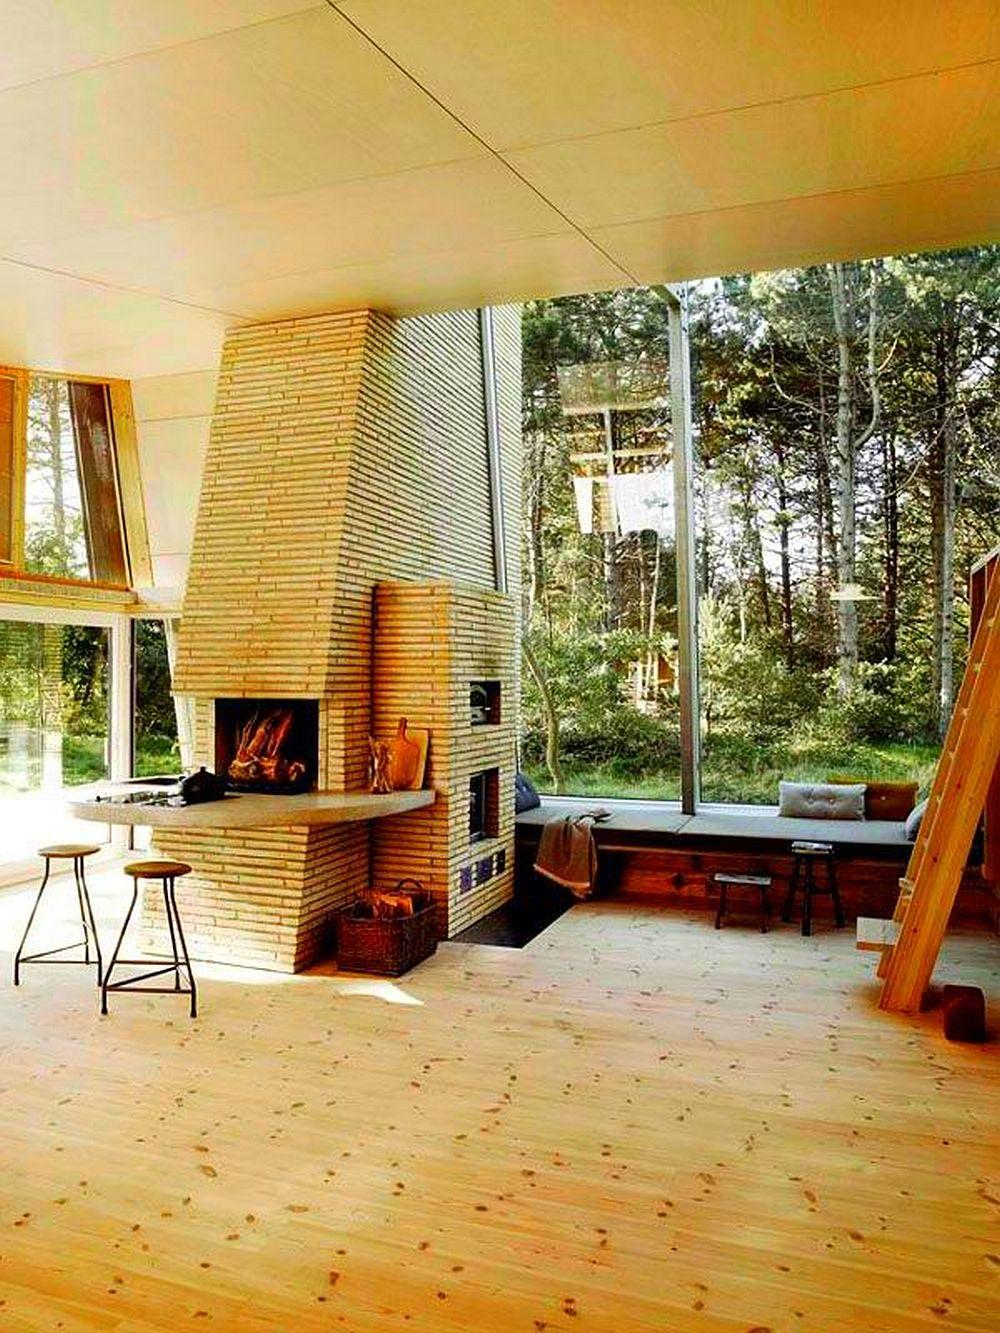 adelaparvu.com despre casa de vacanta moderna, casa daneza, casa din busteni de lemn moderna, arhitect Jesper Brask, Tree House (13)